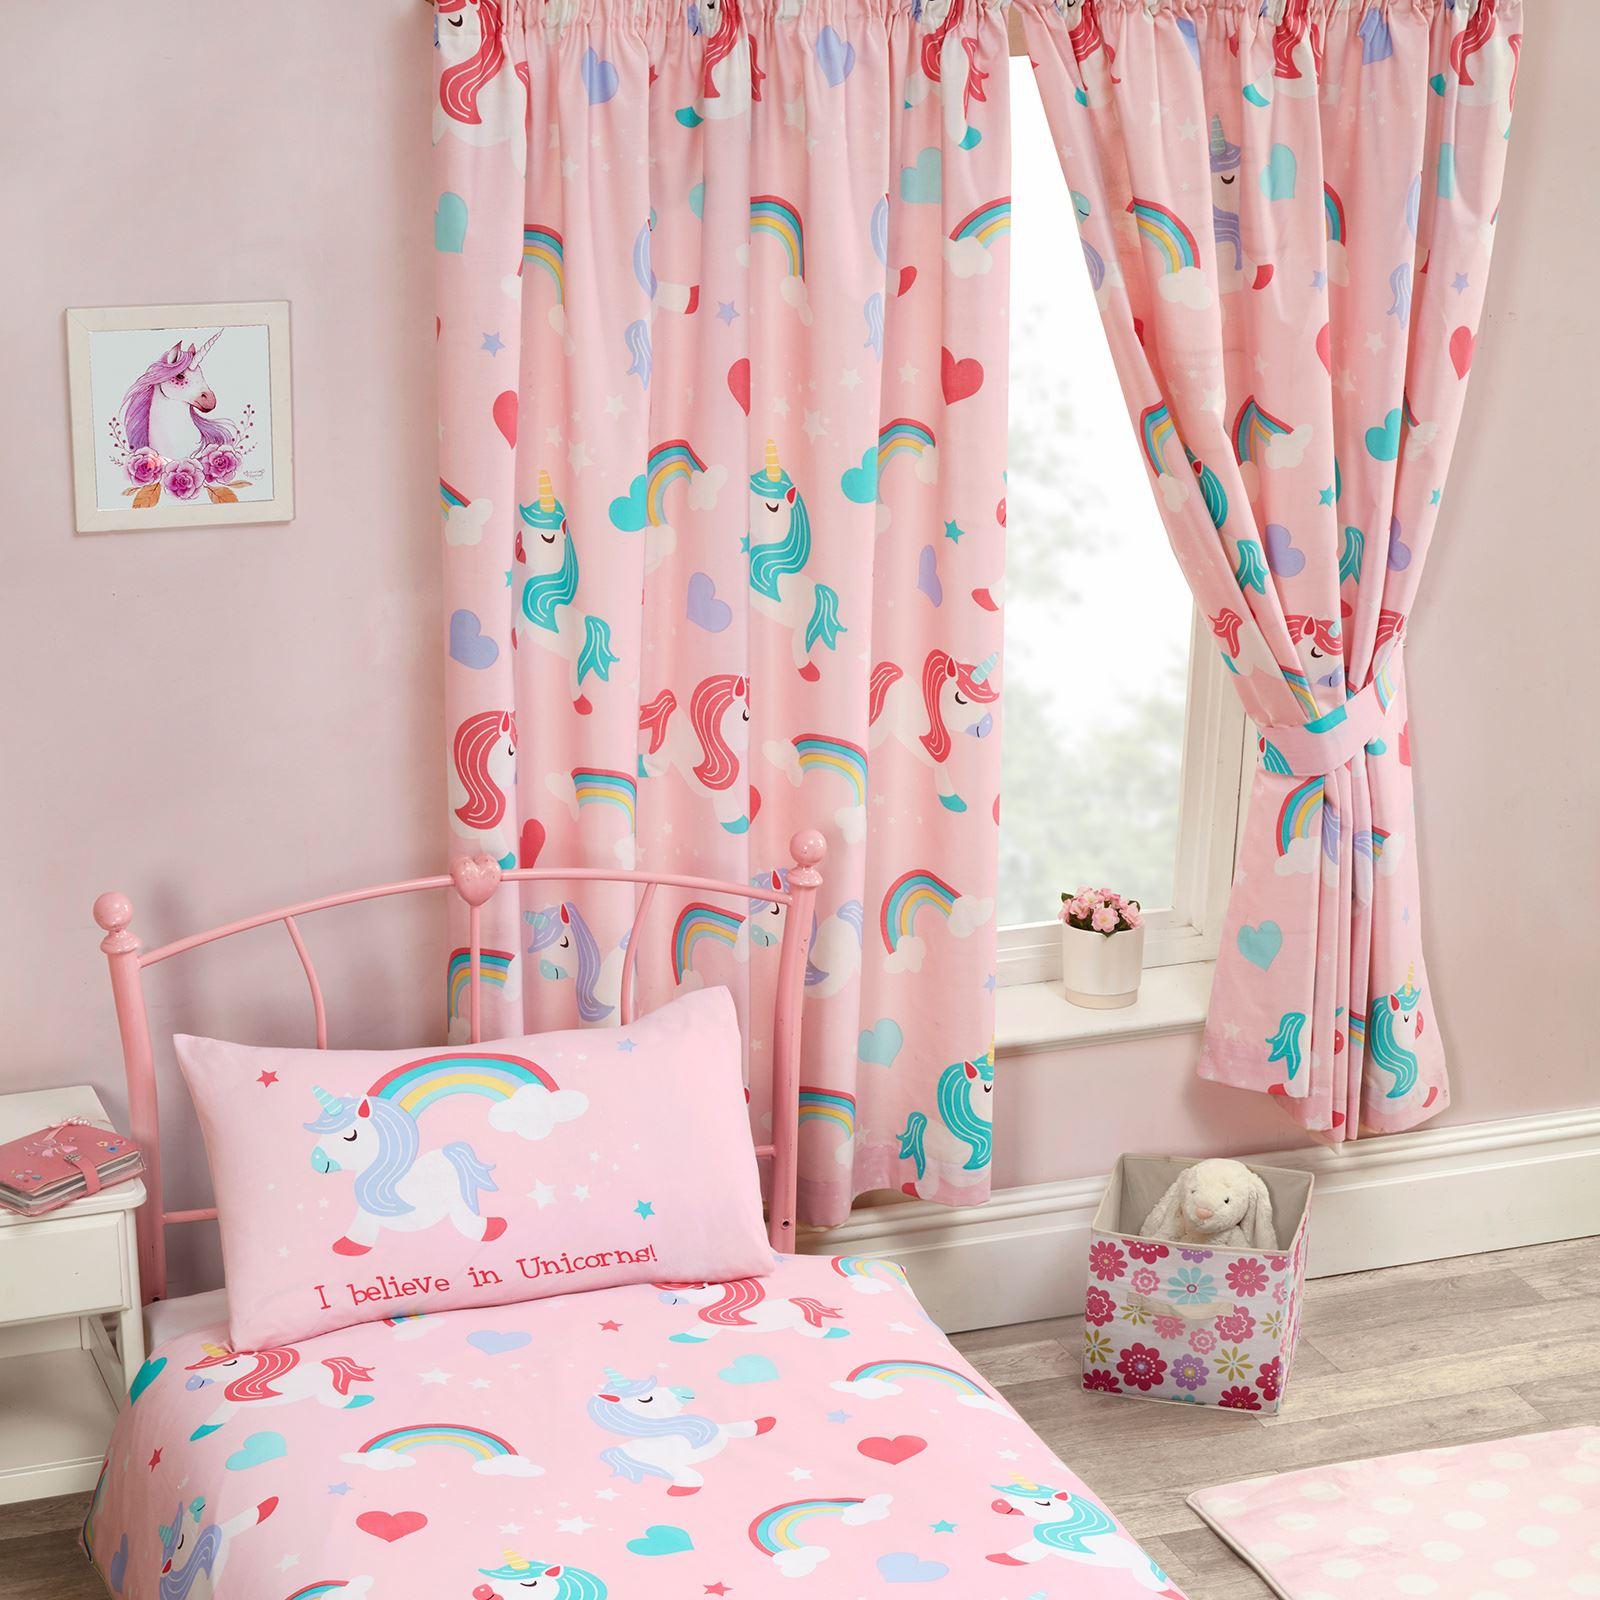 kinder m dchen jungen passend bettbezug sets einzeln. Black Bedroom Furniture Sets. Home Design Ideas